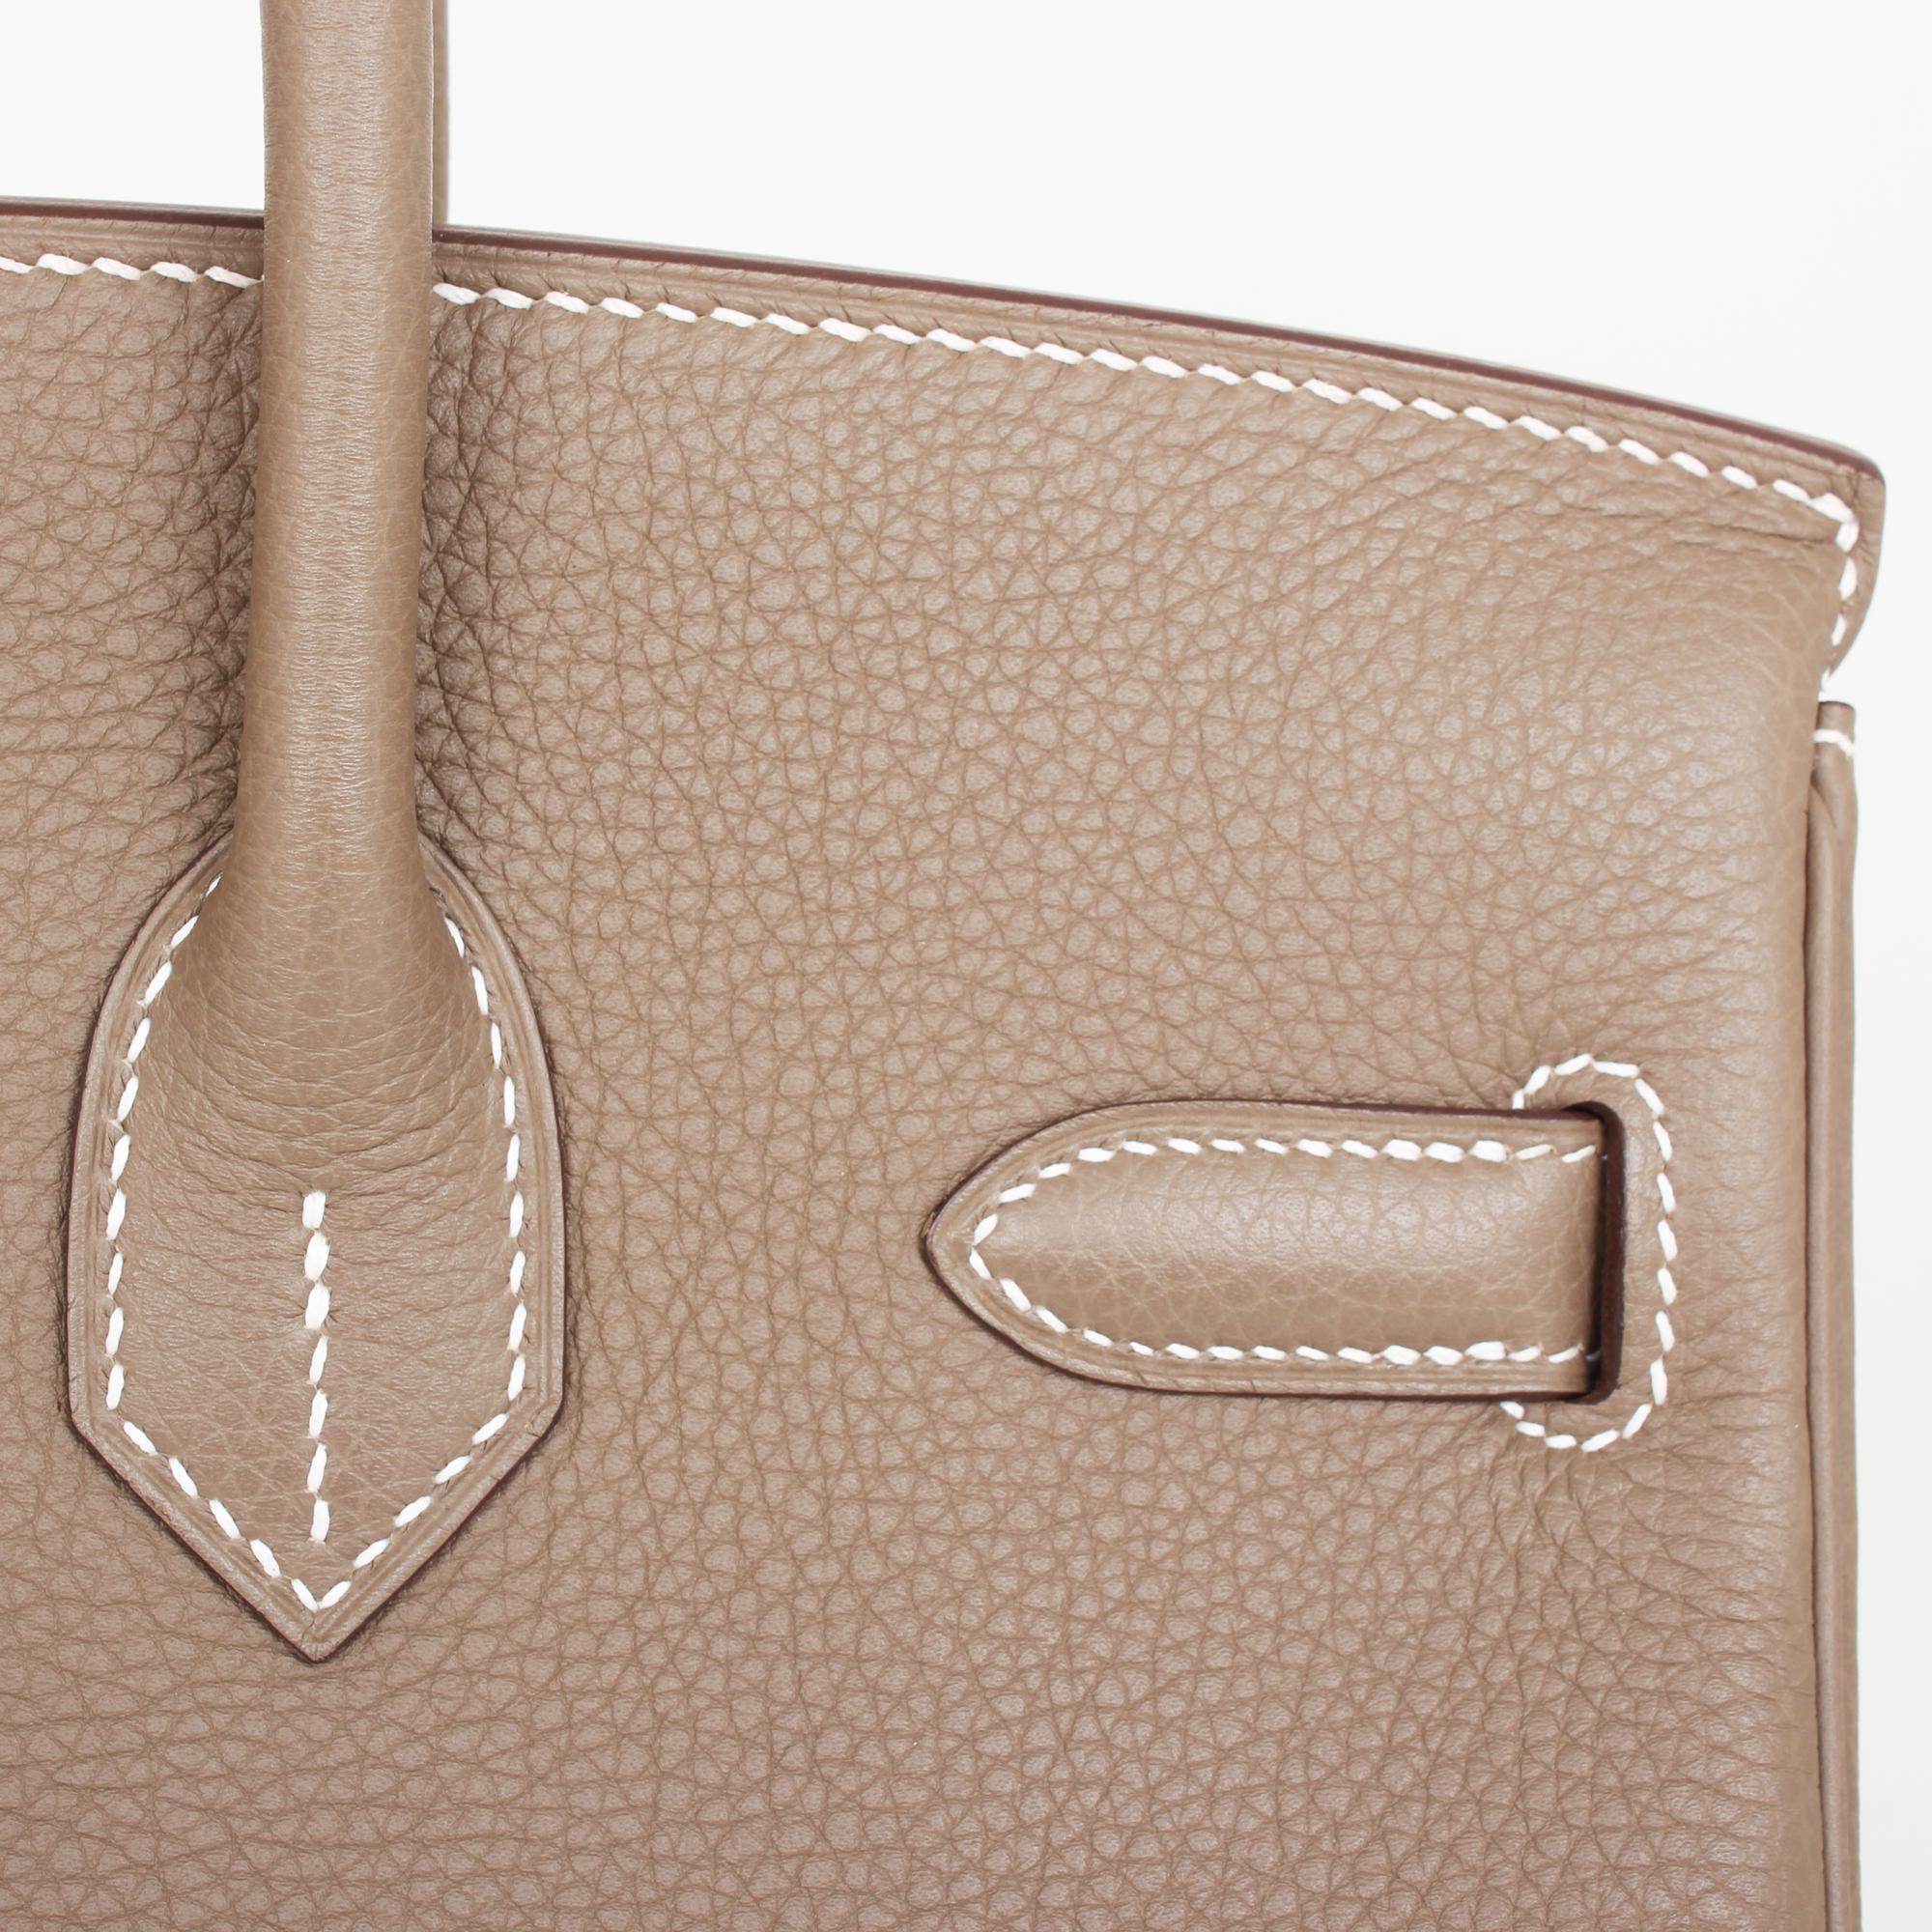 c6ca554e0c5 Leather detail image of hermes birkin bag taupe togo